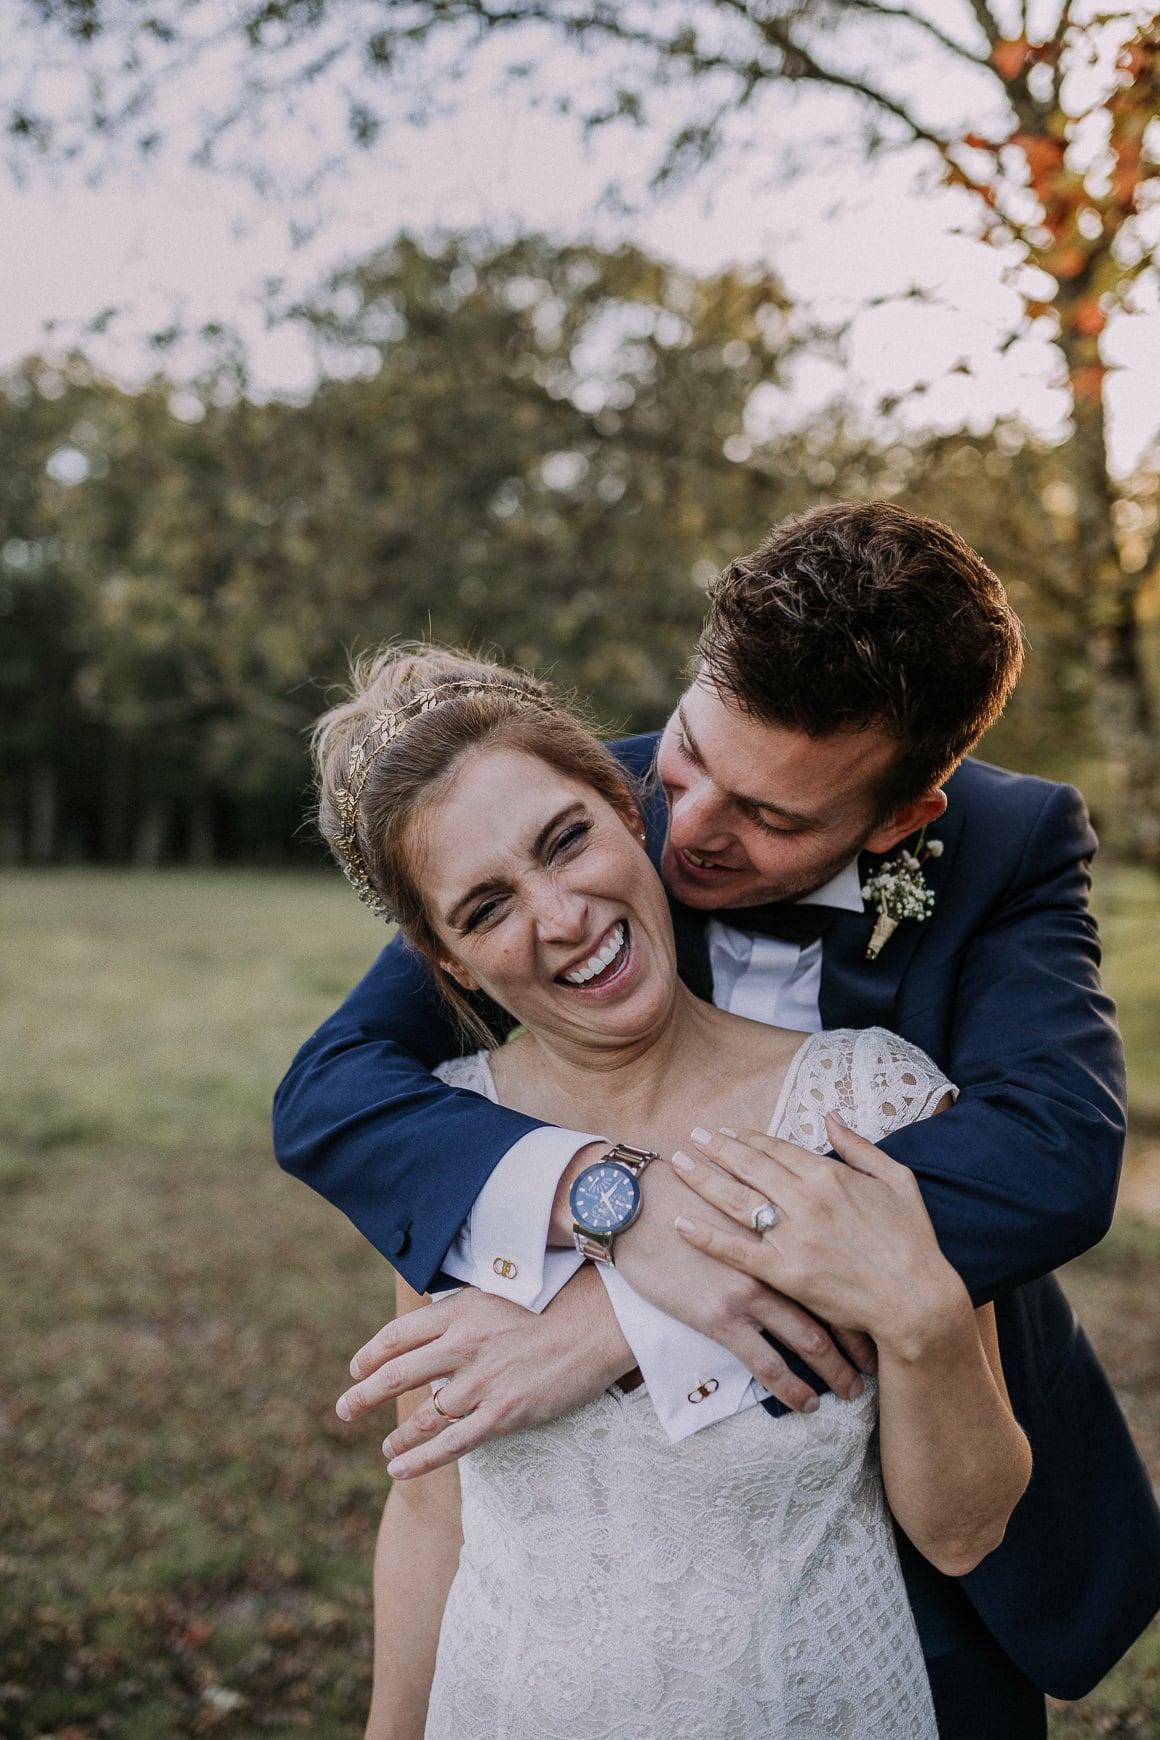 mariage boheme chic trigaliere